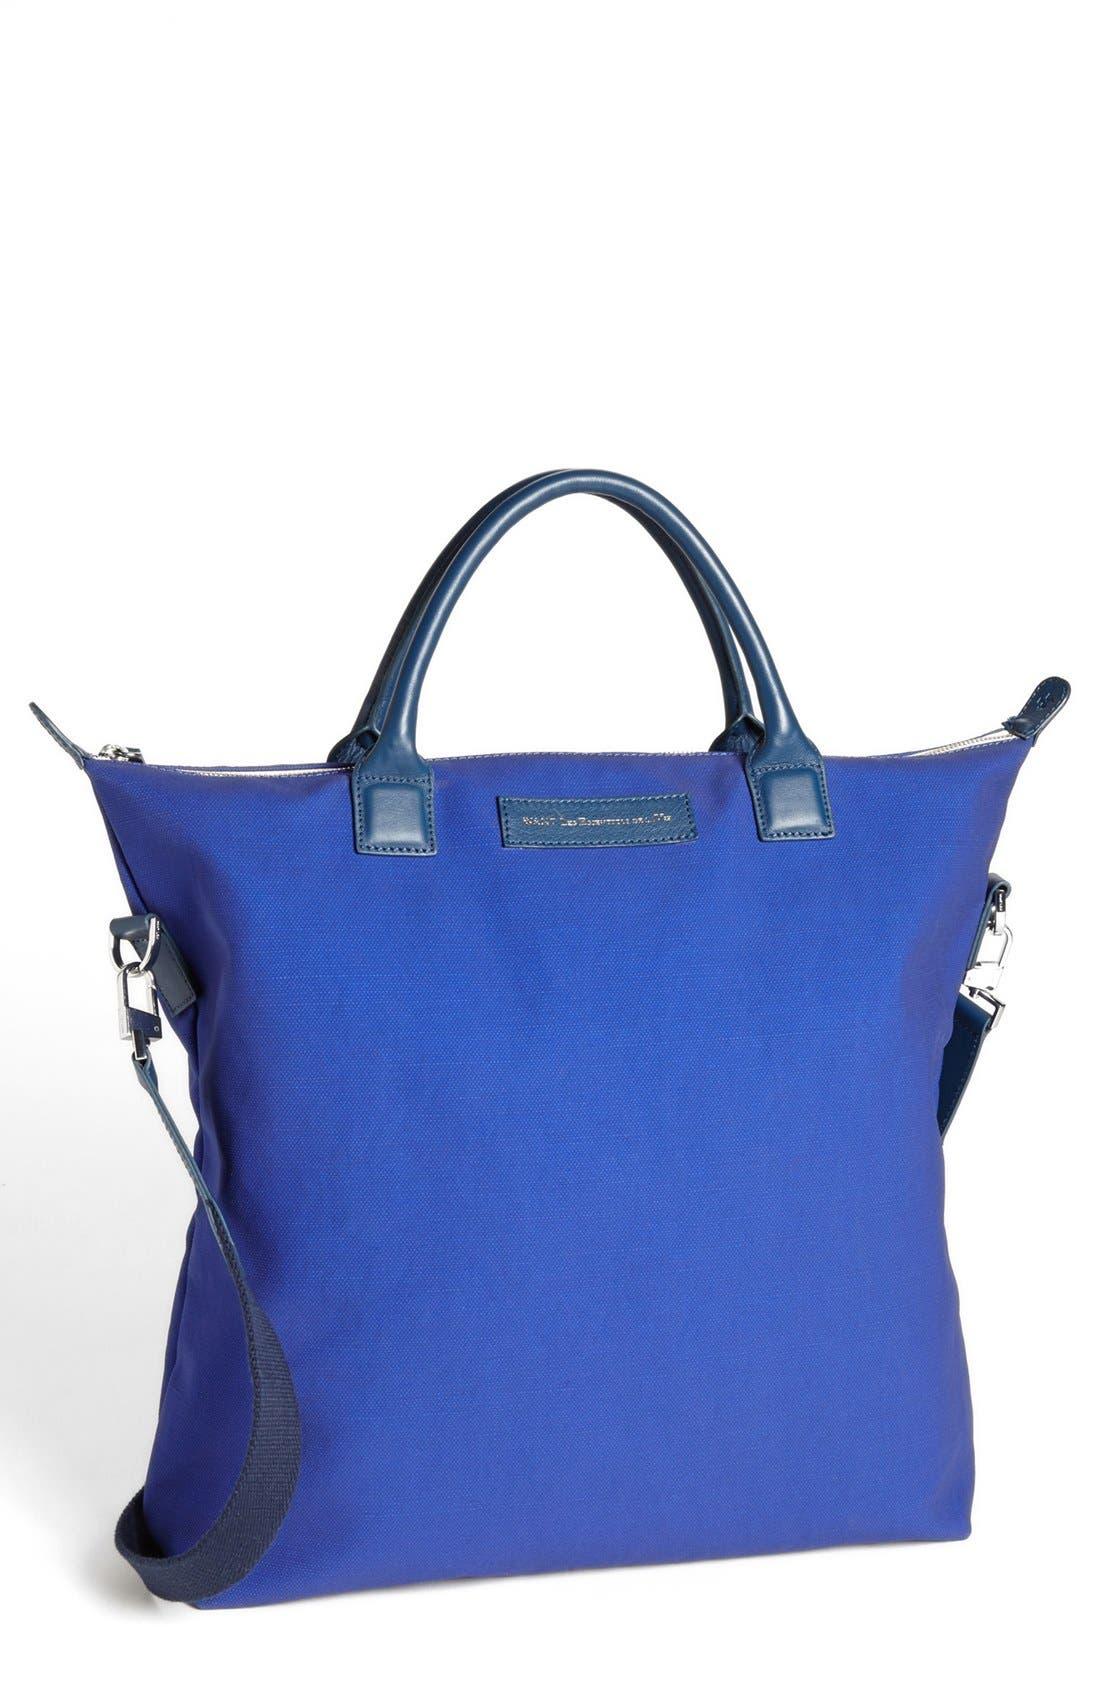 Main Image - WANT Les Essentiels de la Vie 'O'Hare' Tote Bag